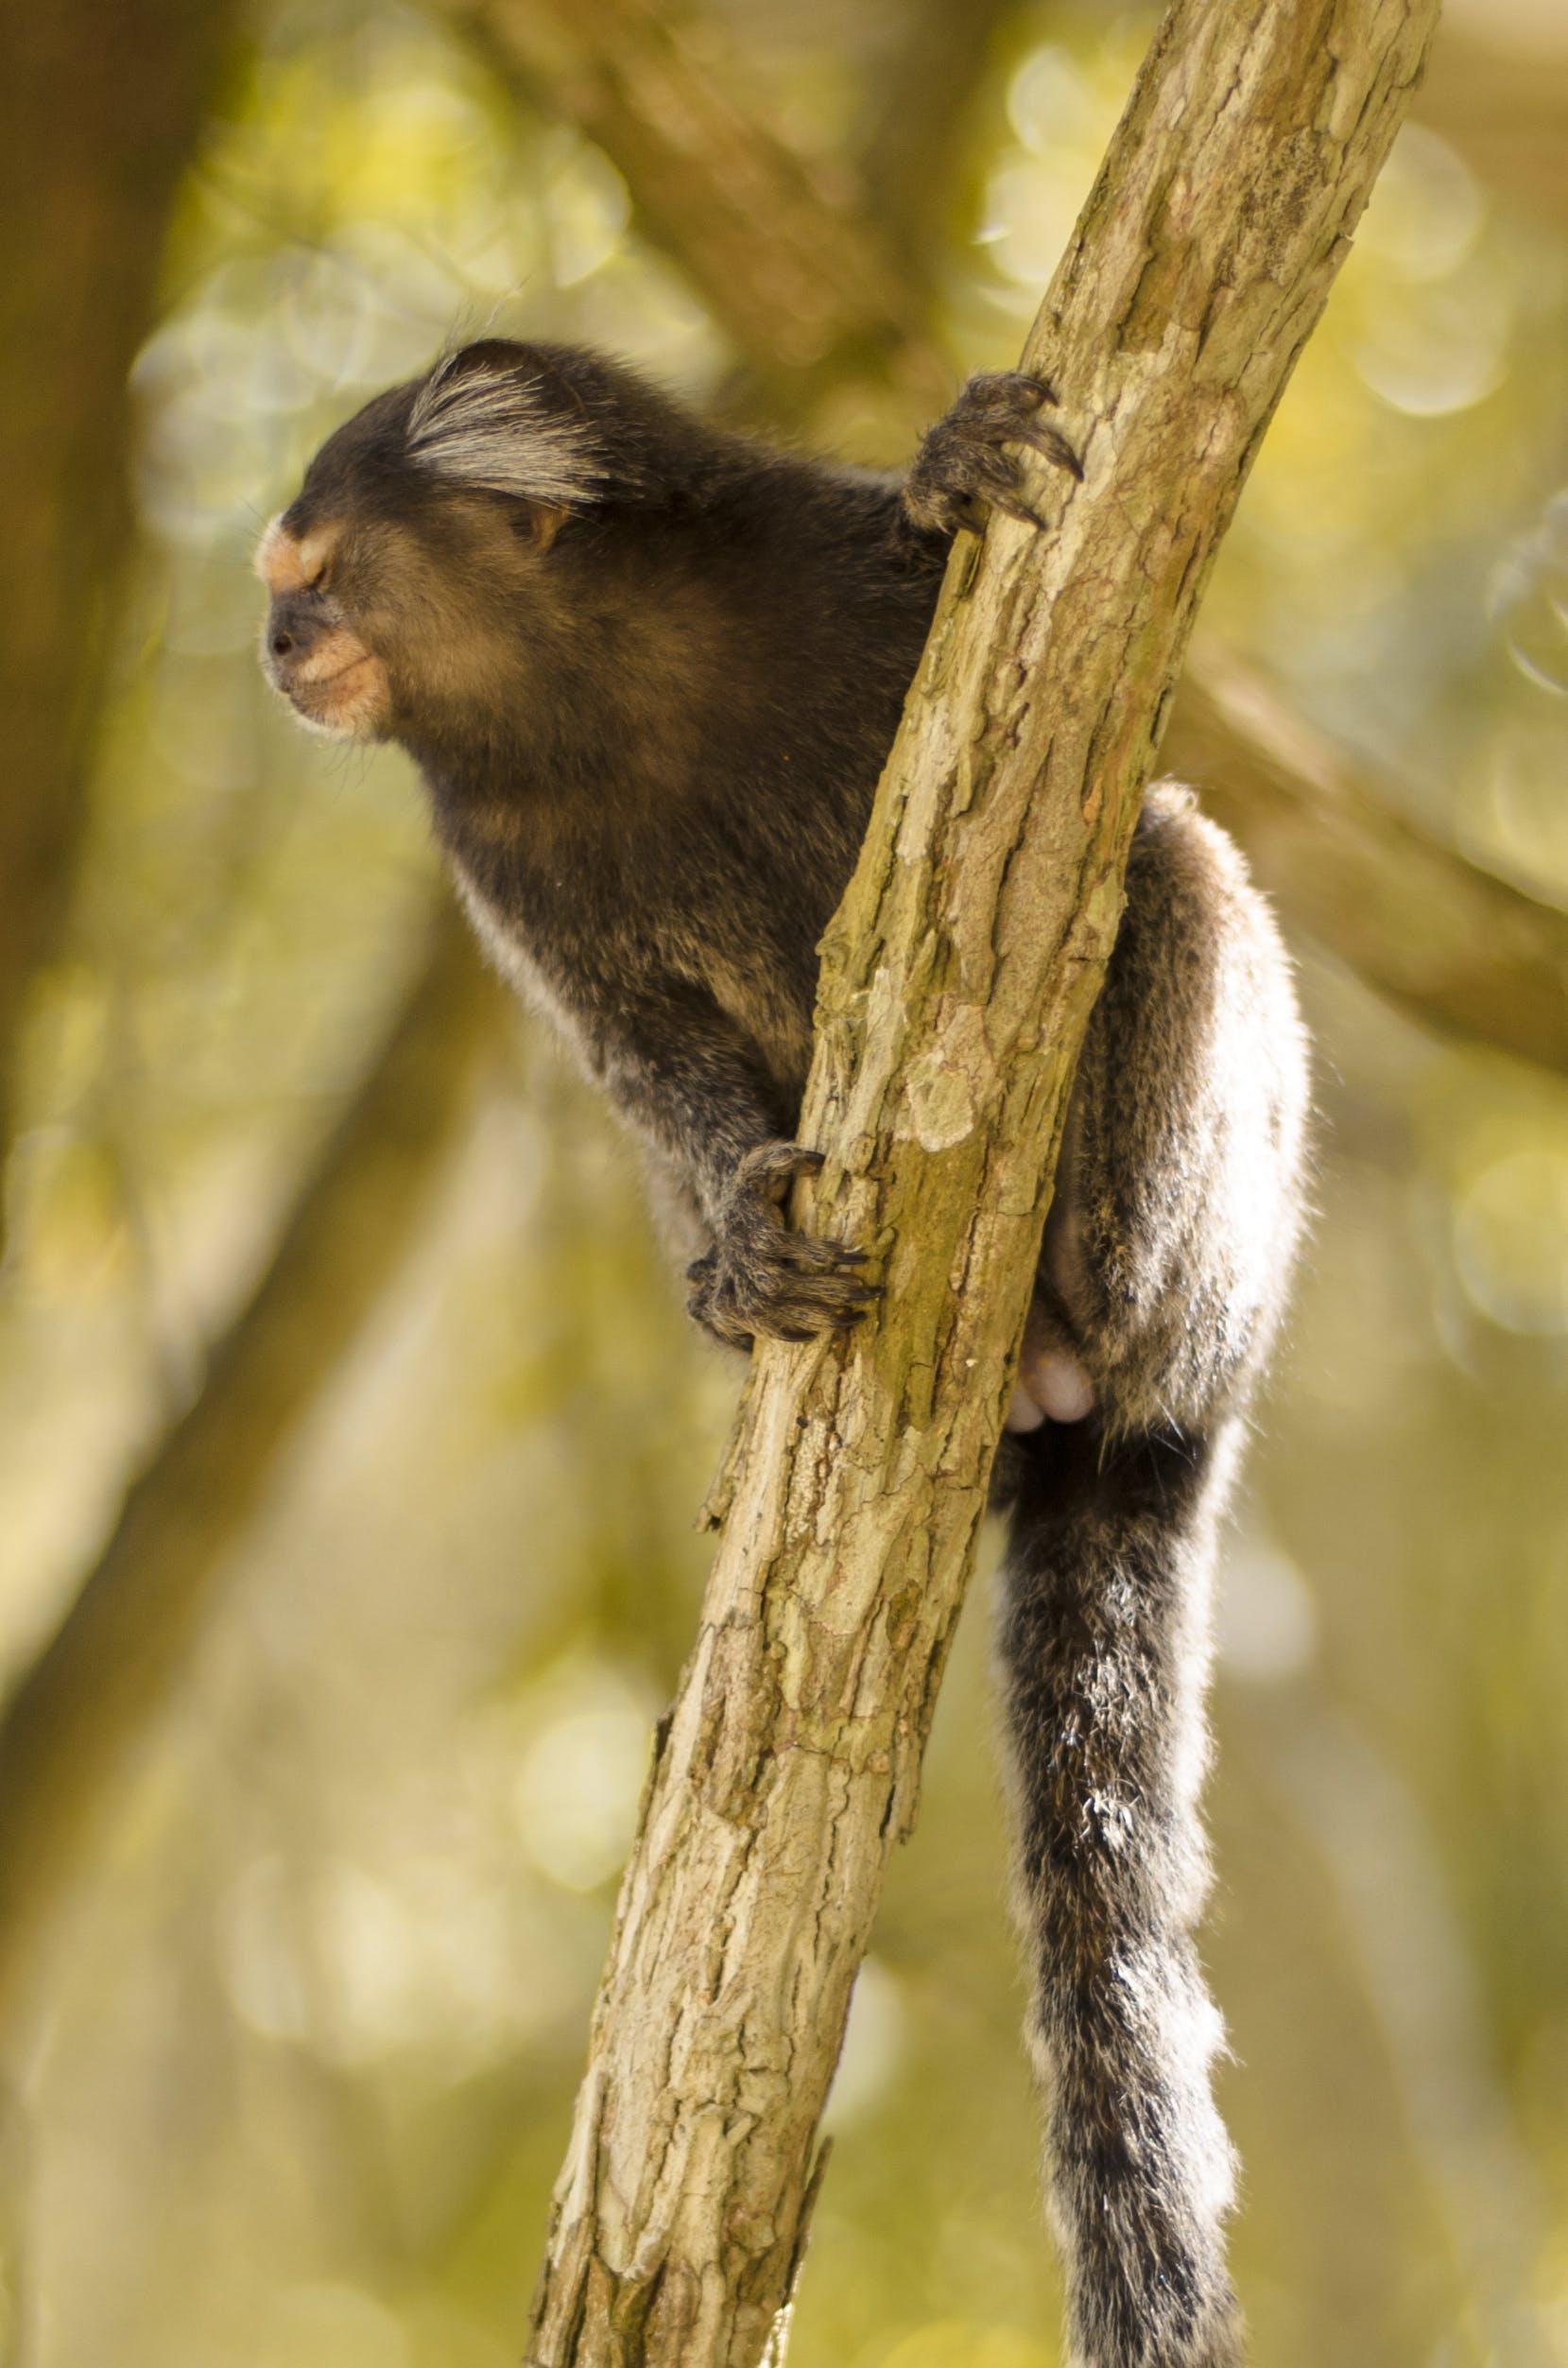 Free stock photo of animal, monkey, brazil, botanical garden